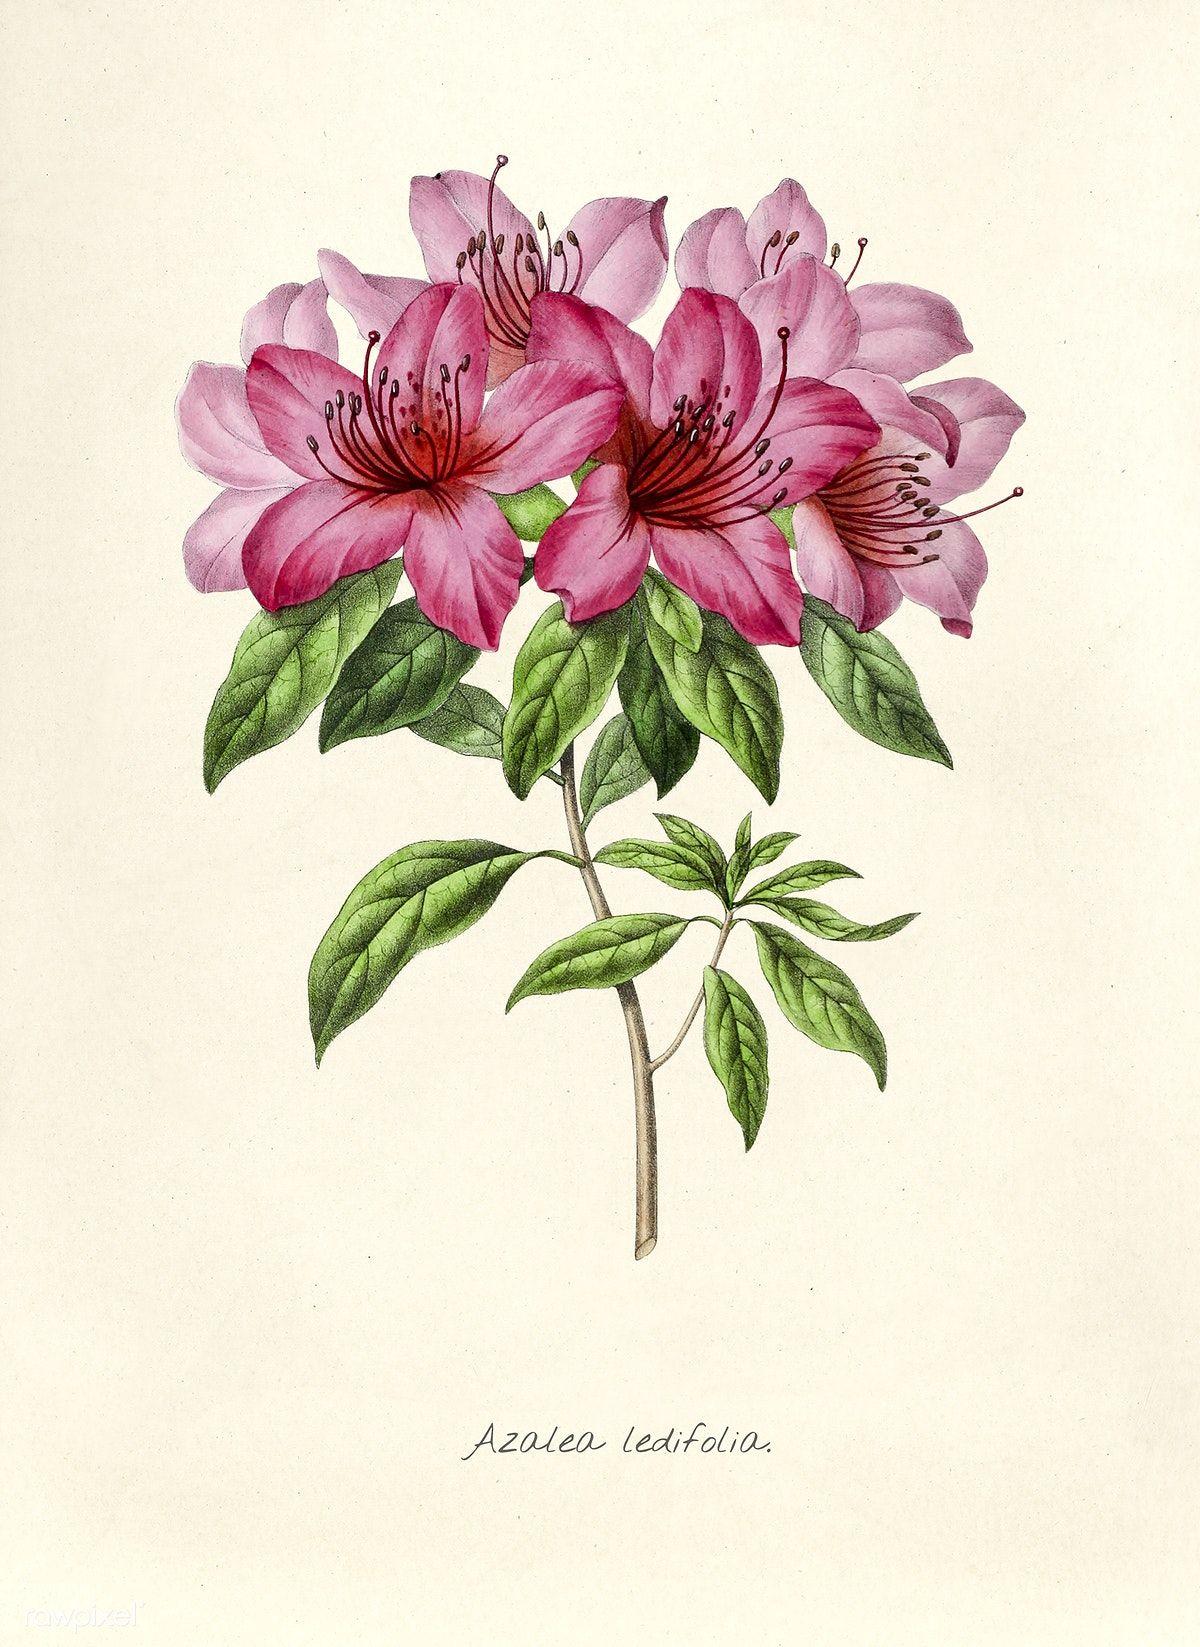 Antique Illustration Of Azalea Ledifolia Free Image By Rawpixel Com Vintage Flower Prints Azalea Flower Flower Wall Art